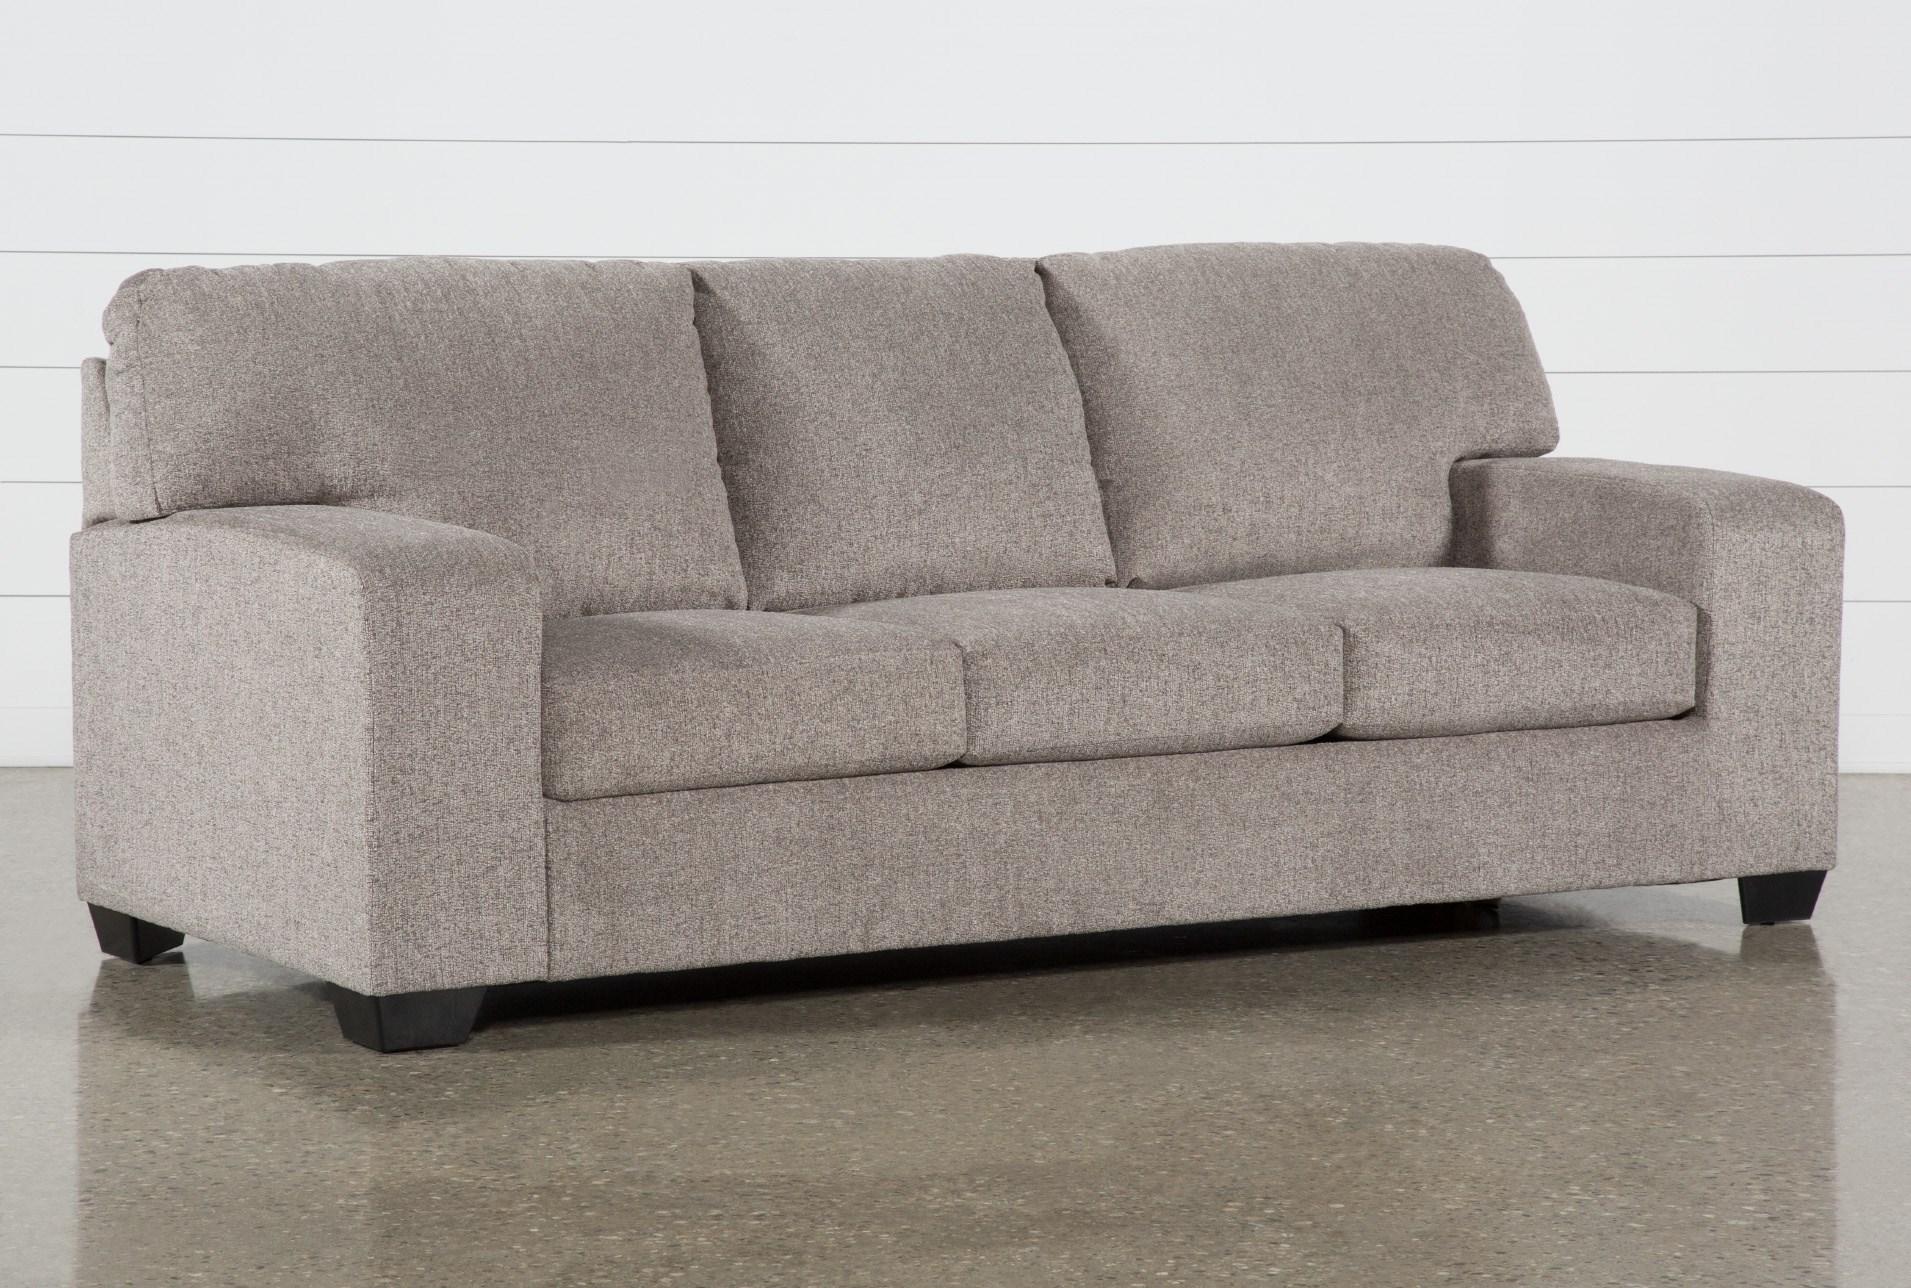 Oates Queen Sofa Sleeper